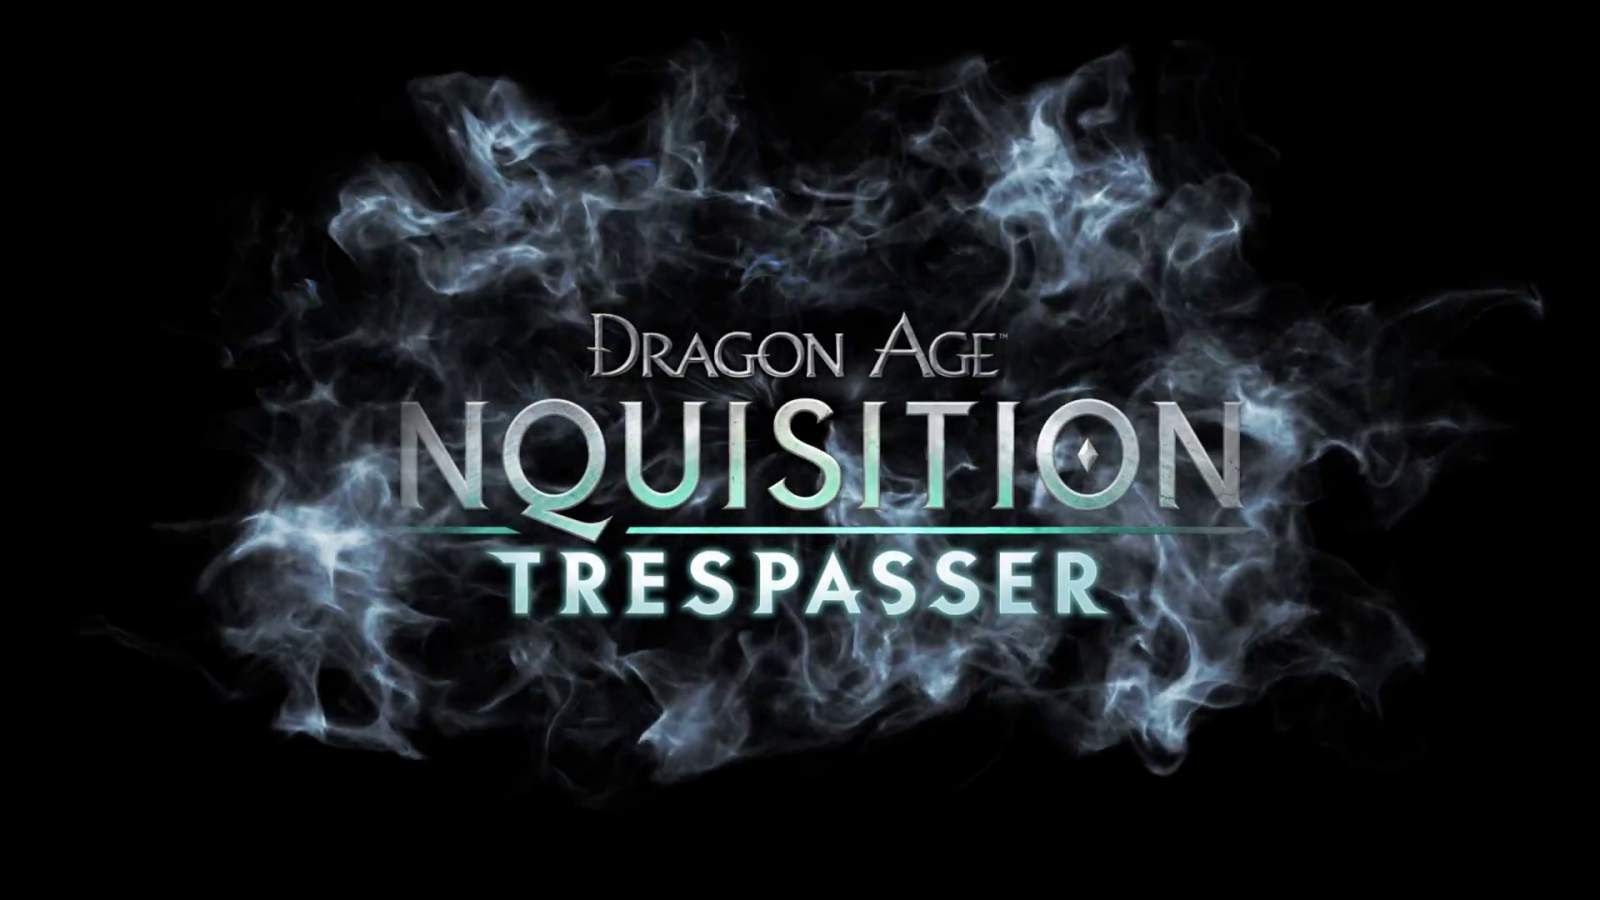 dragon-age-inquisition-trespasser-logo